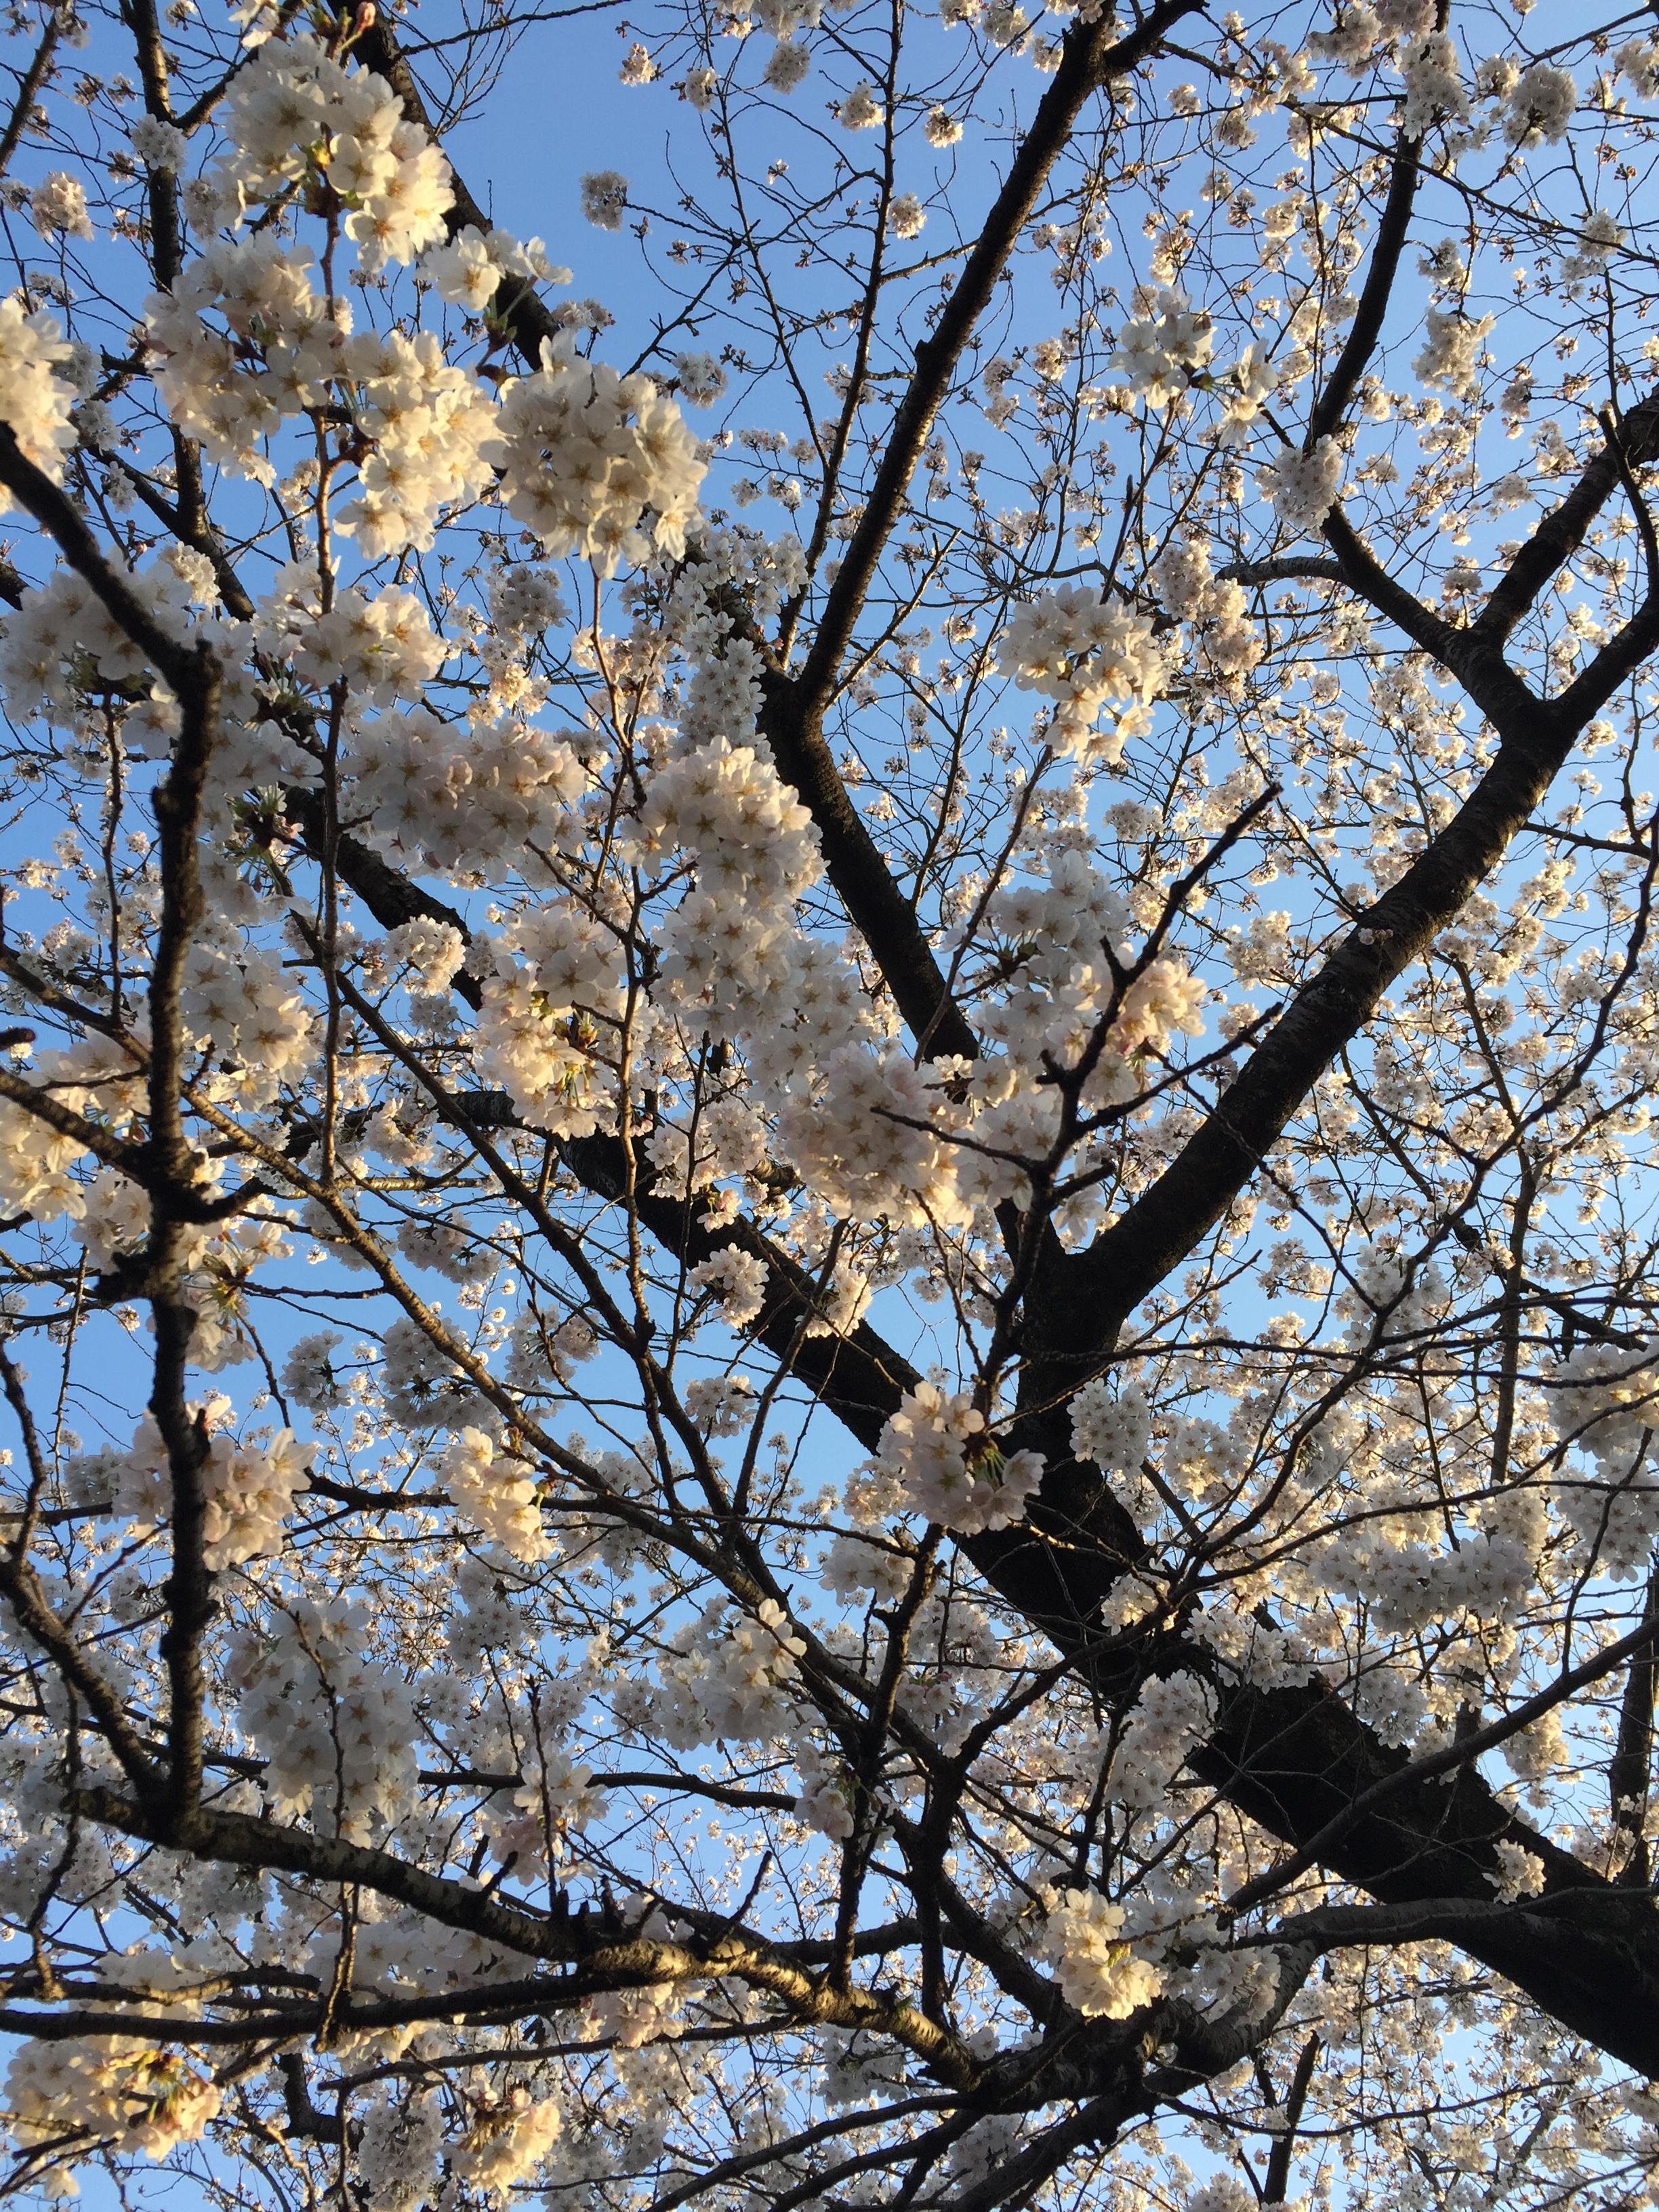 Foto 25-03-18, 15 51 18.jpg